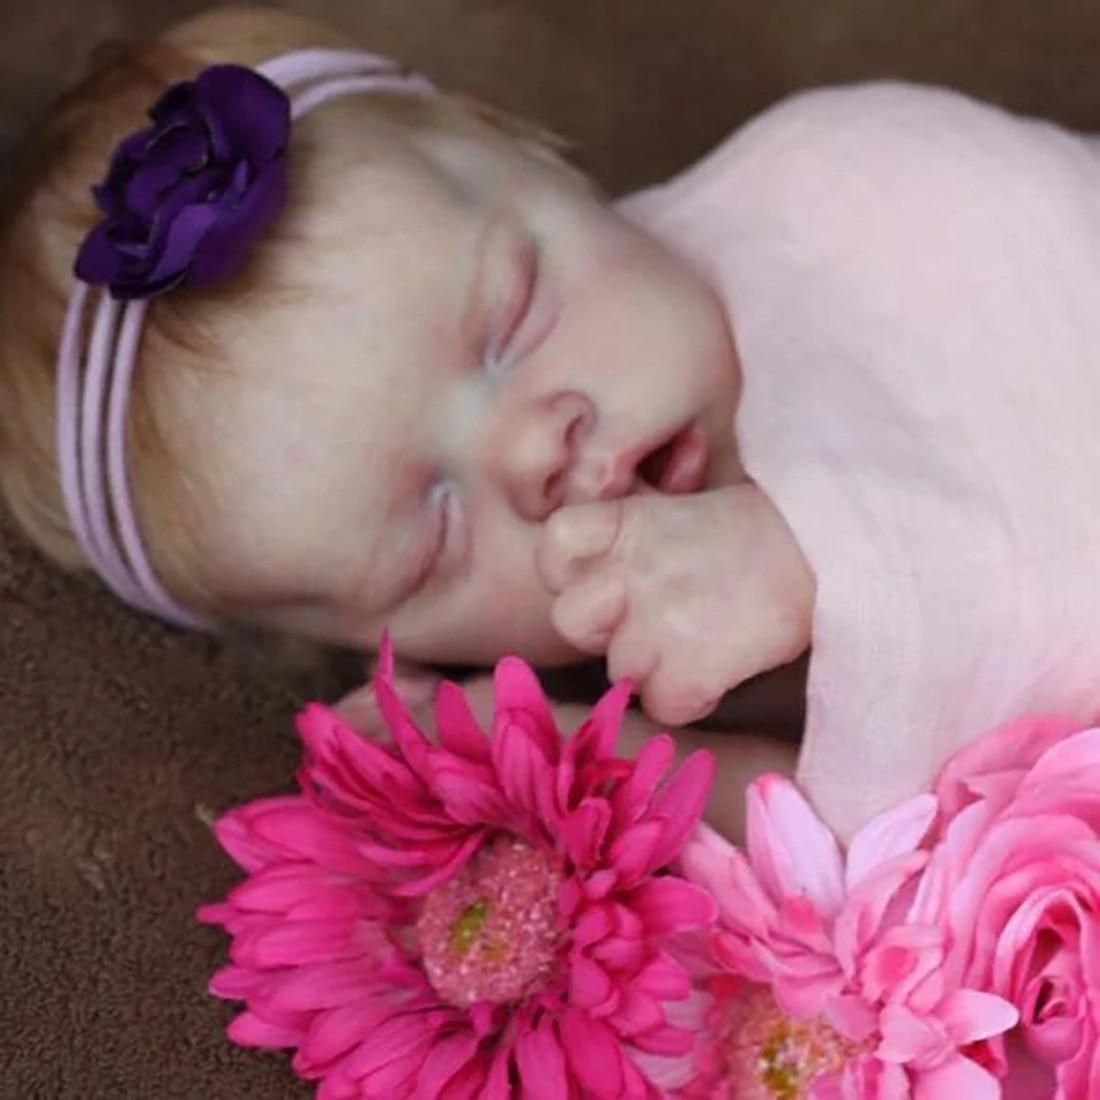 17 Inches Twin A Lifelike Cute Emmalyn Reborn Baby Doll Girl Costume Set Kids Gift- Silicone Vinyl Body (Cloth Is Random)